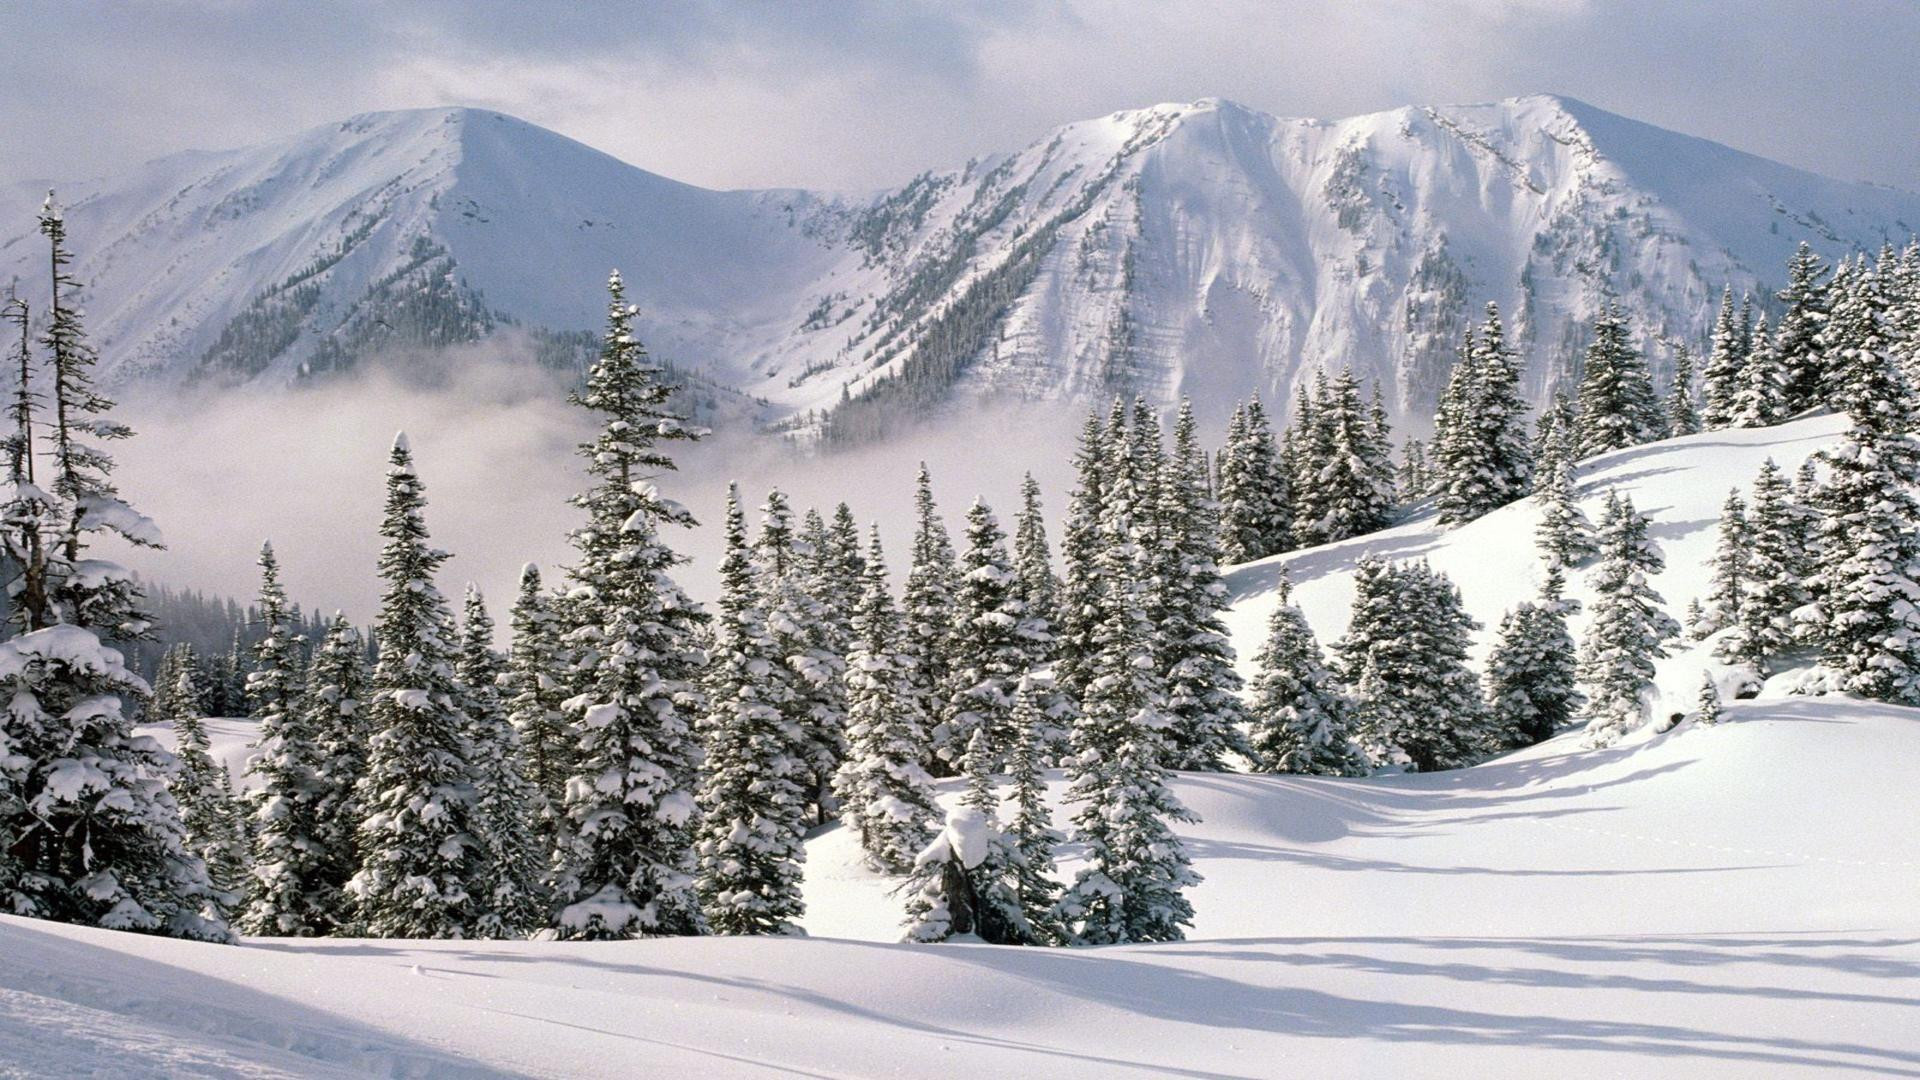 ws_Winter_1920x1080.jpg